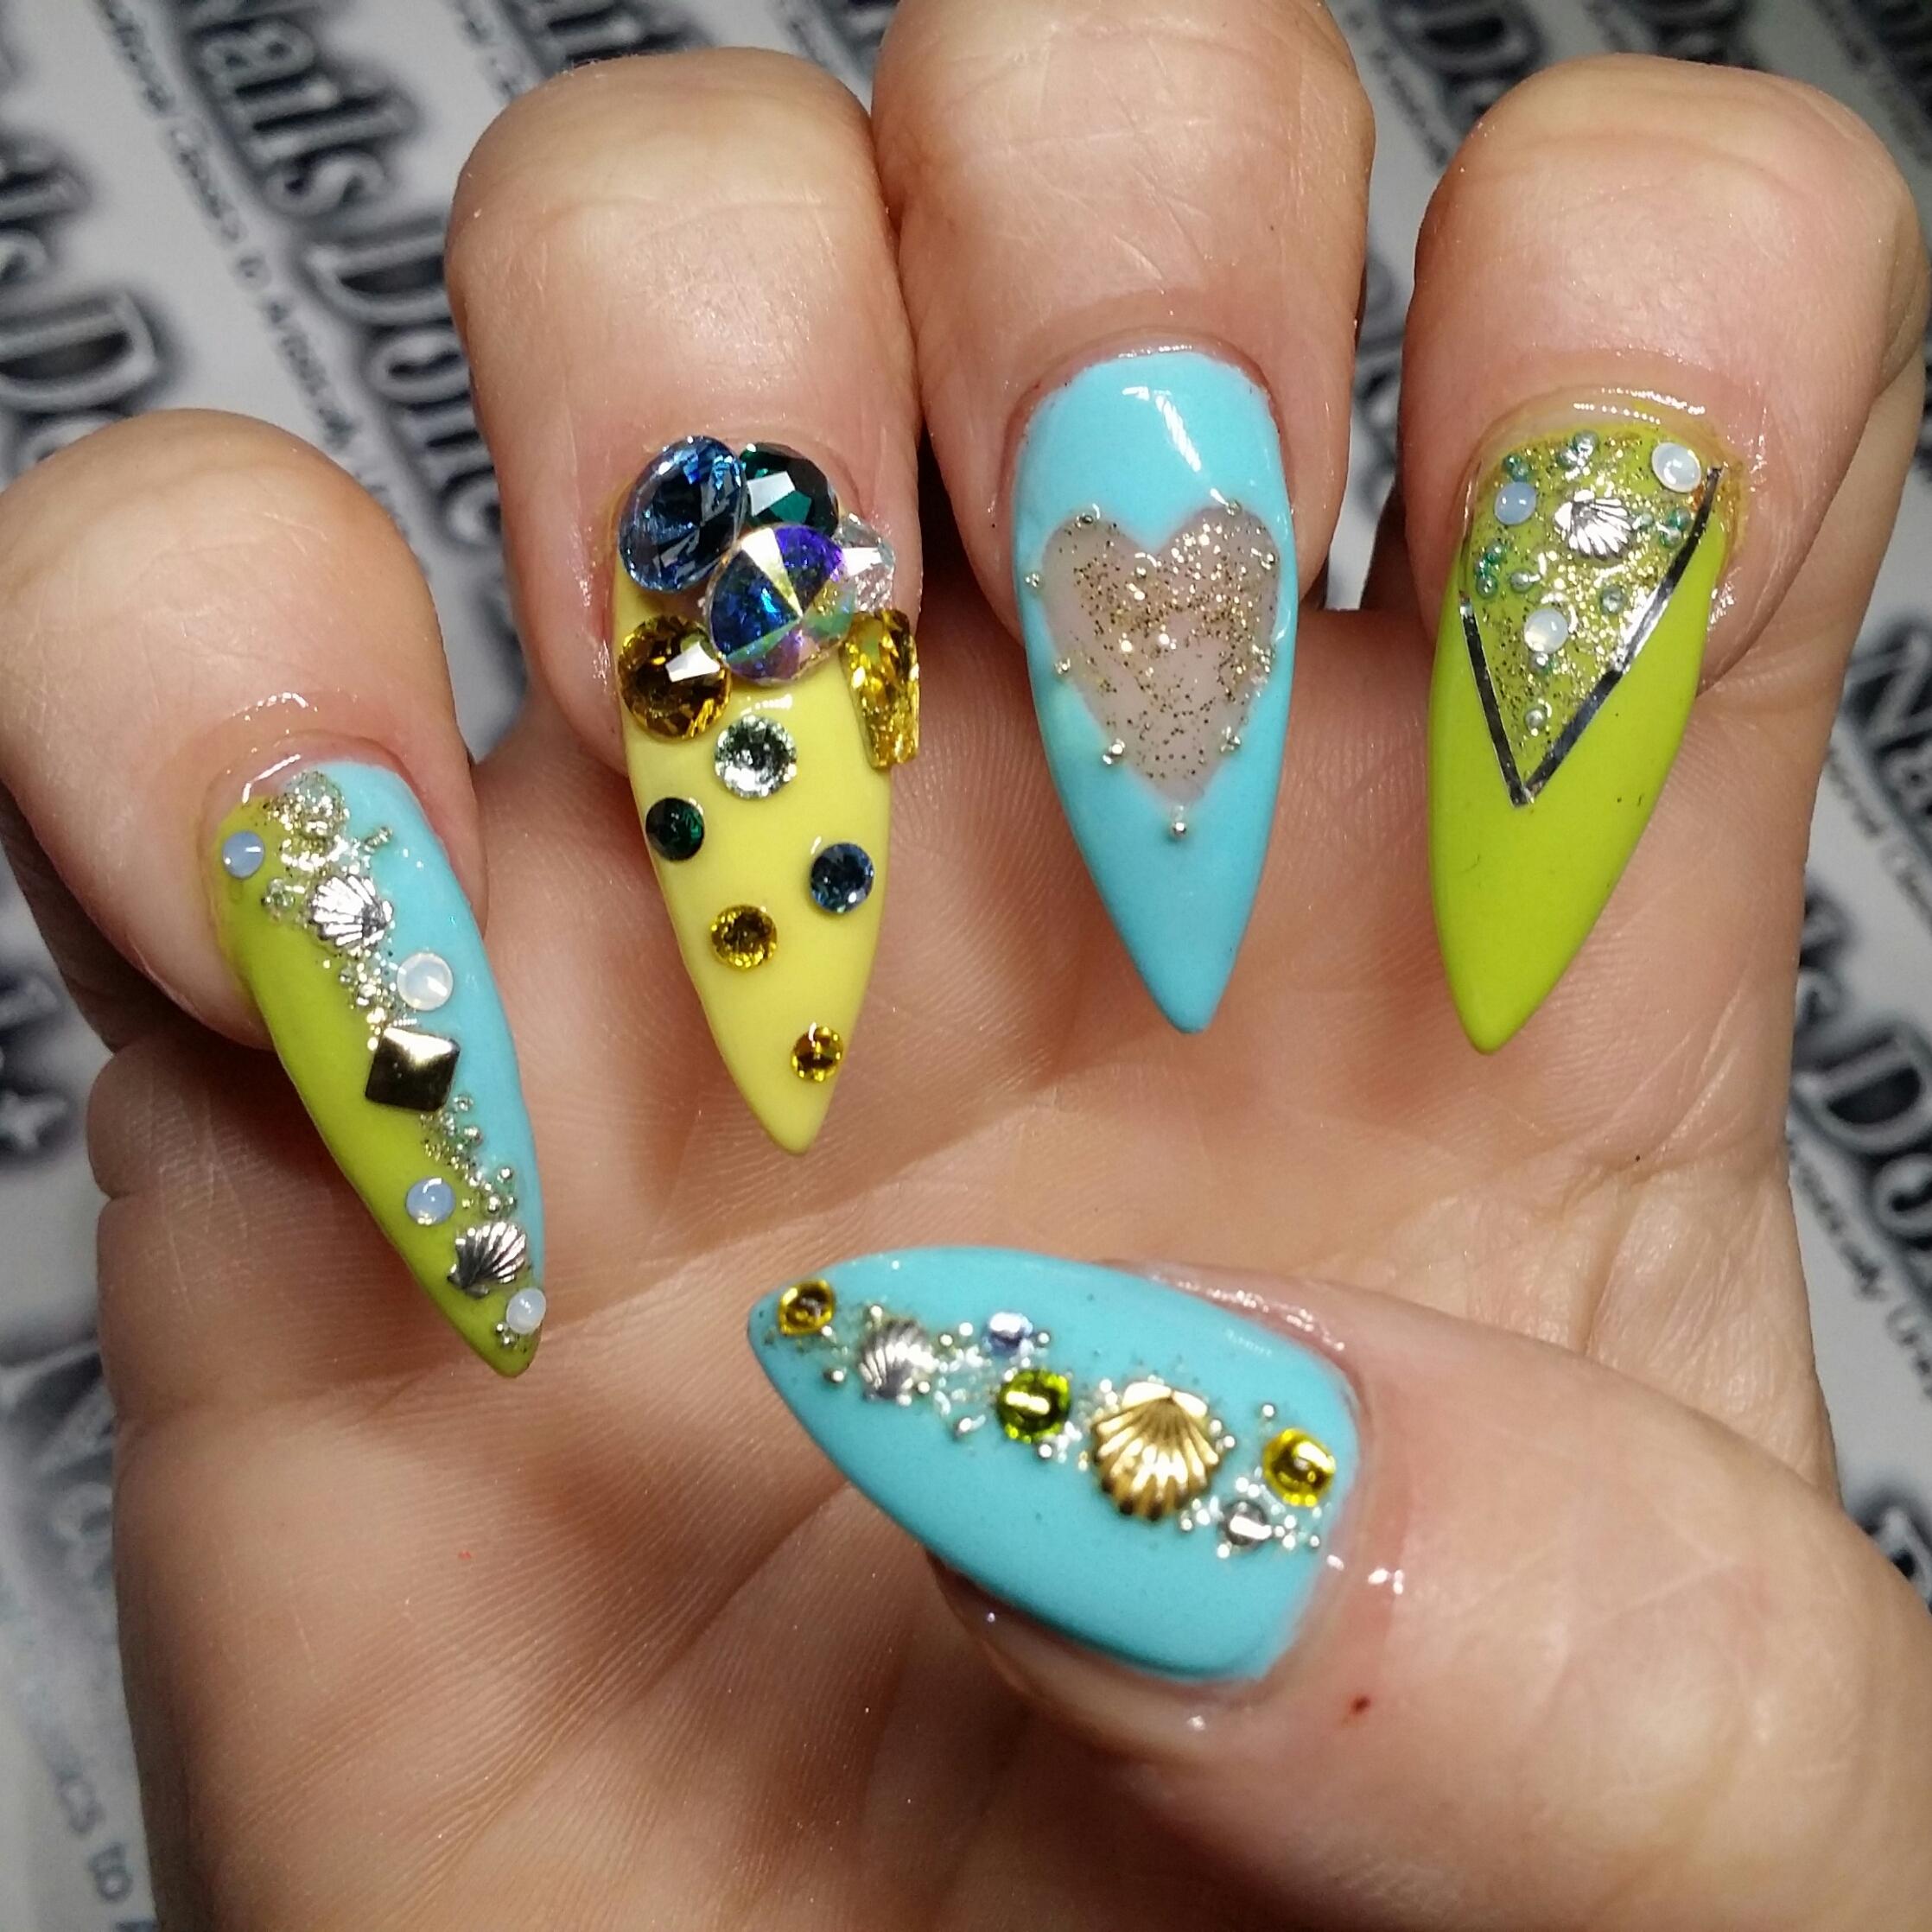 stiletto nails | Nails Done Right